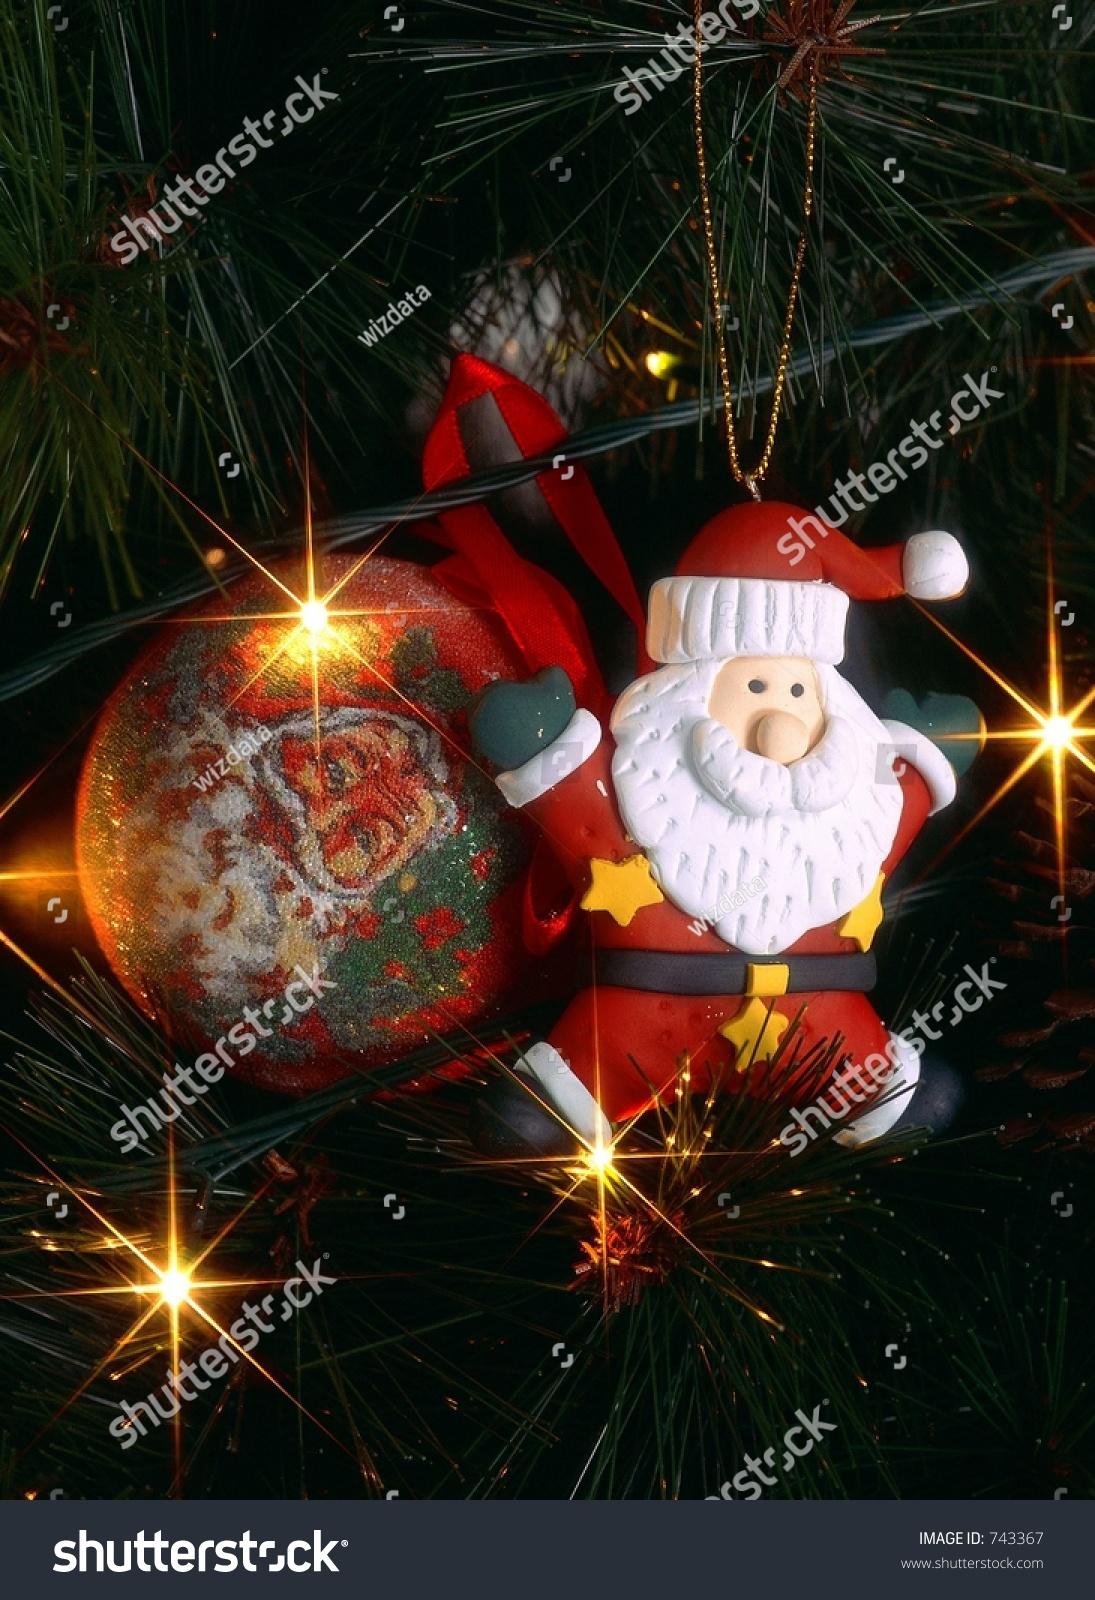 Christmas decoration photo editor : Image photo editor shutterstock